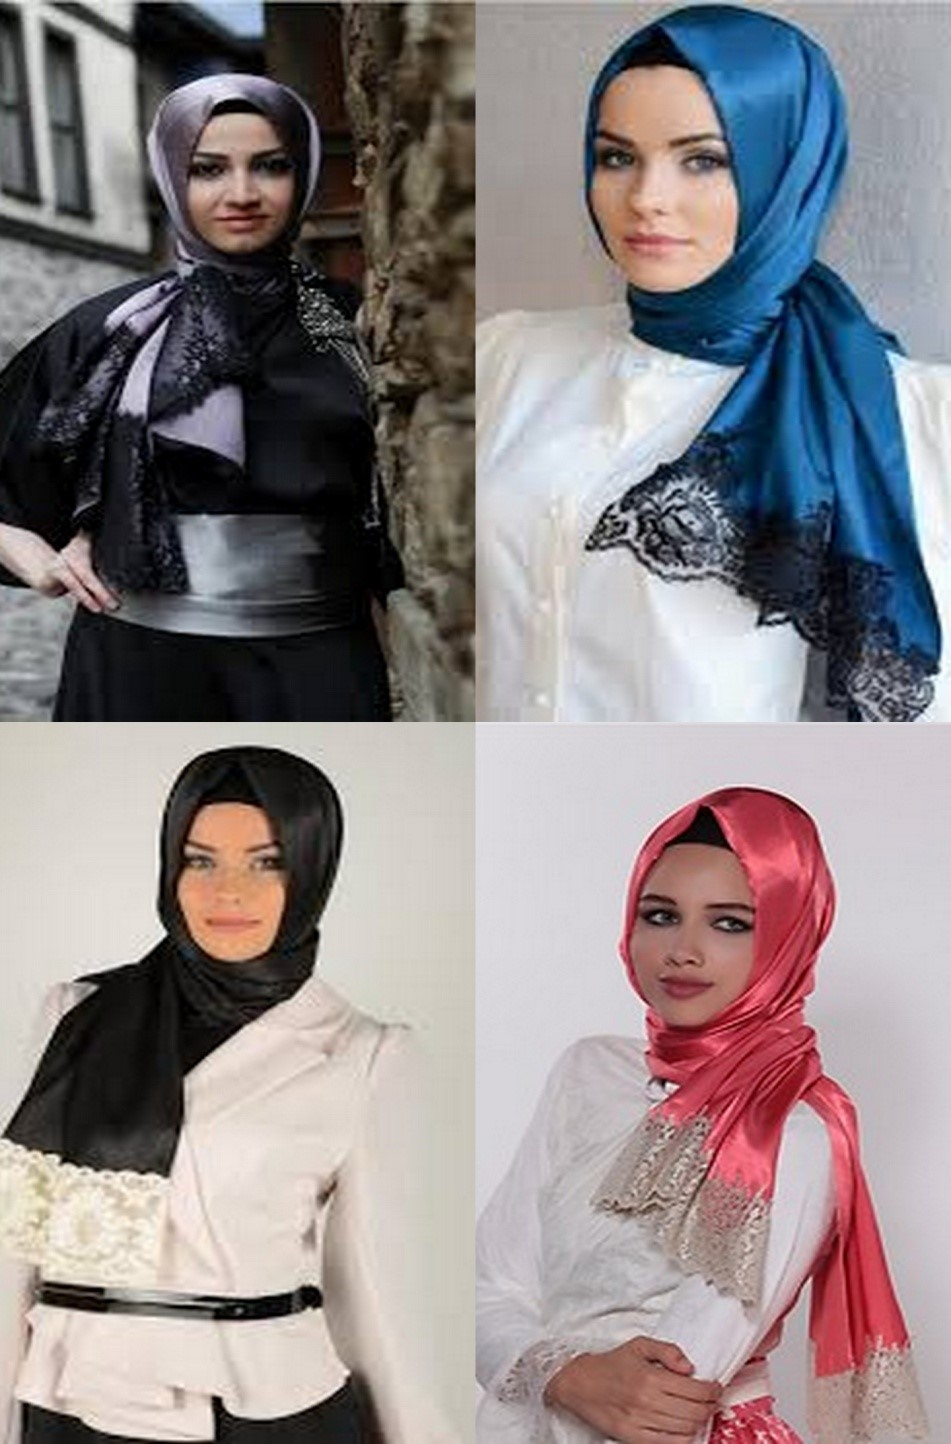 koleksi tren model jilbab terbaru 2013 ~ Mata Iwoi